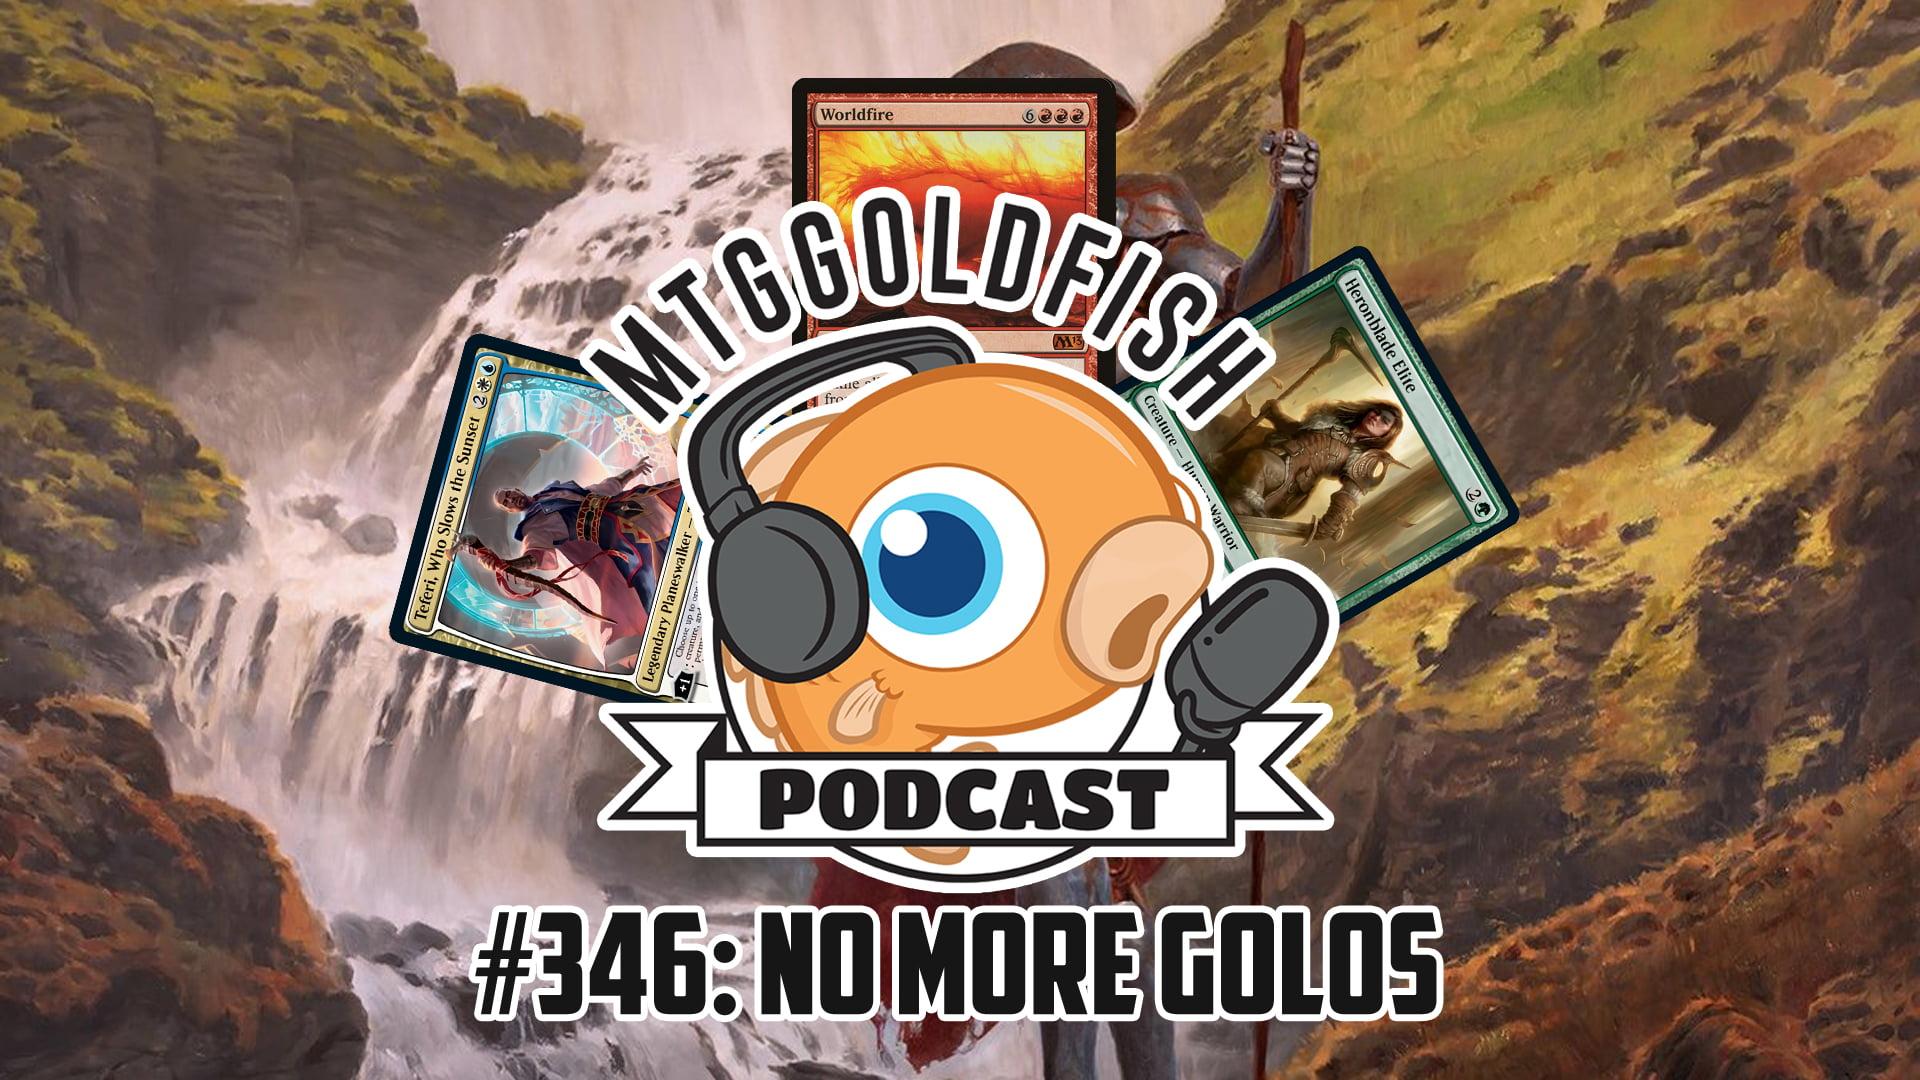 Image for Podcast 346: No More Golos